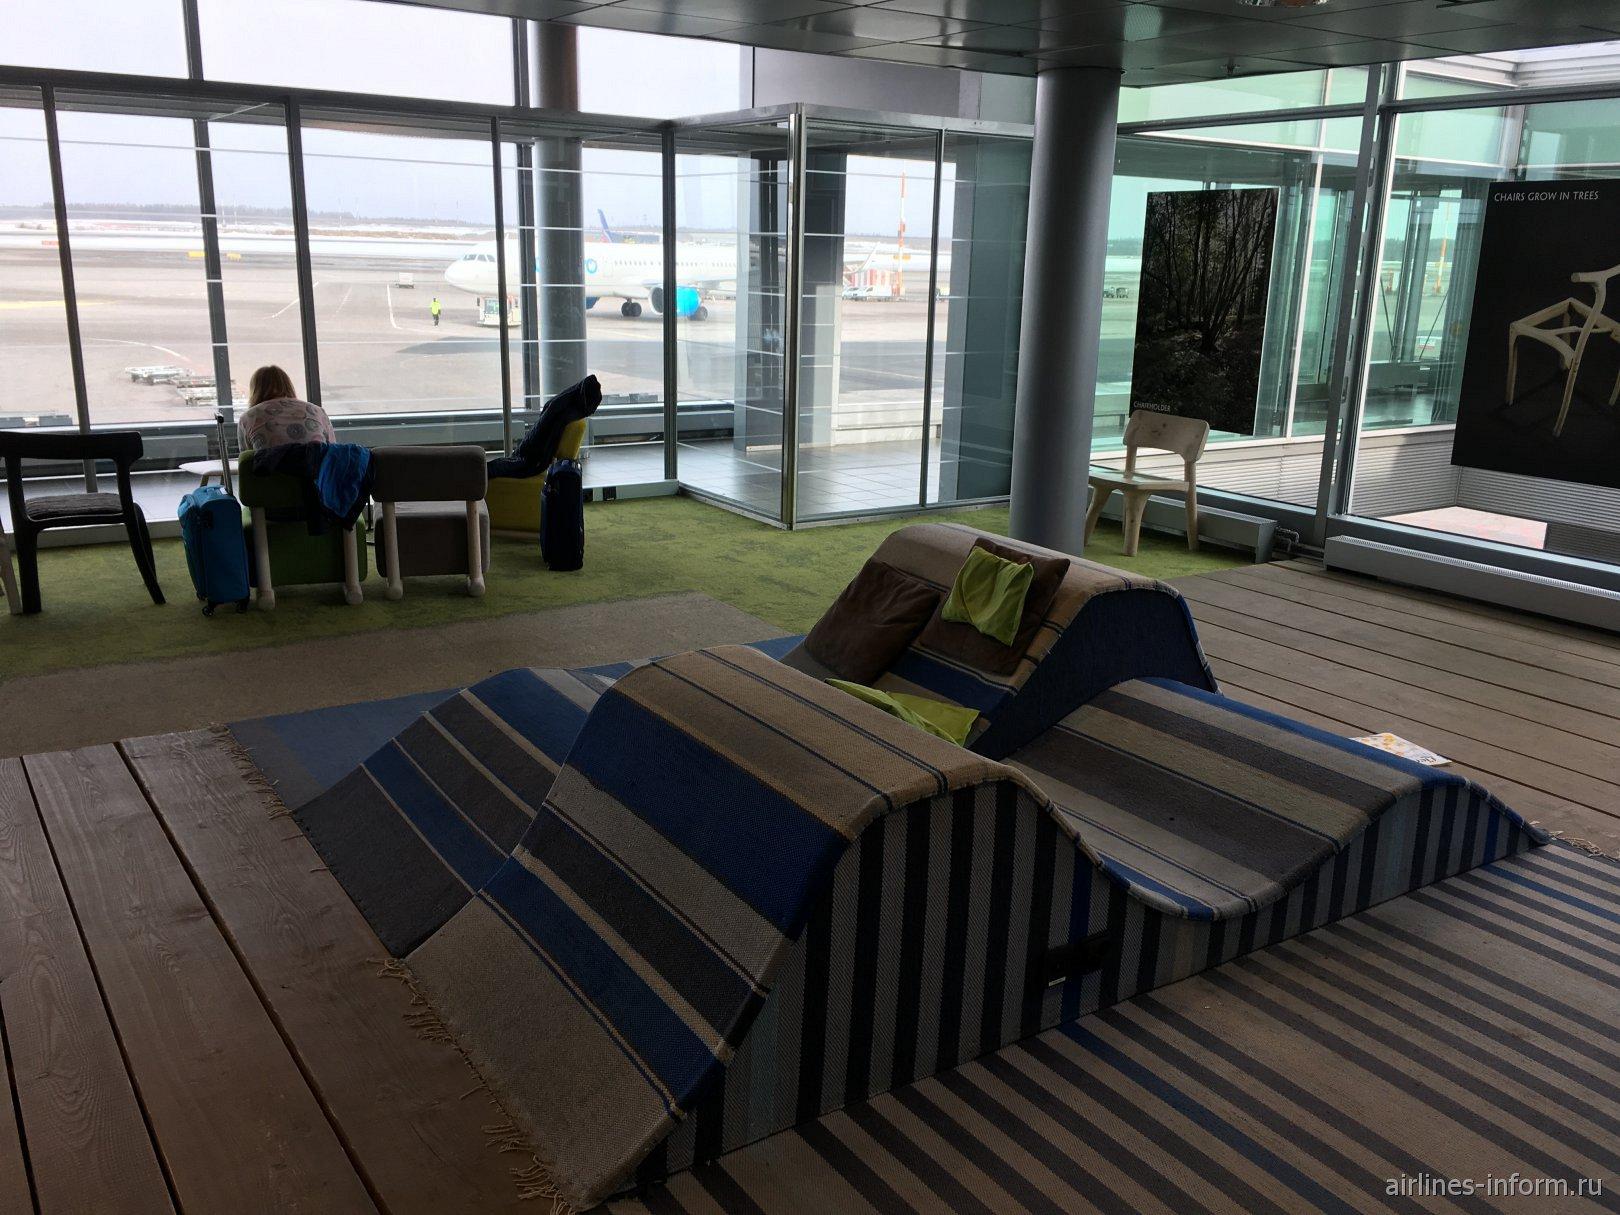 Тихий зал ожидания в терминале 2 аэропорта Хельсинки Вантаа